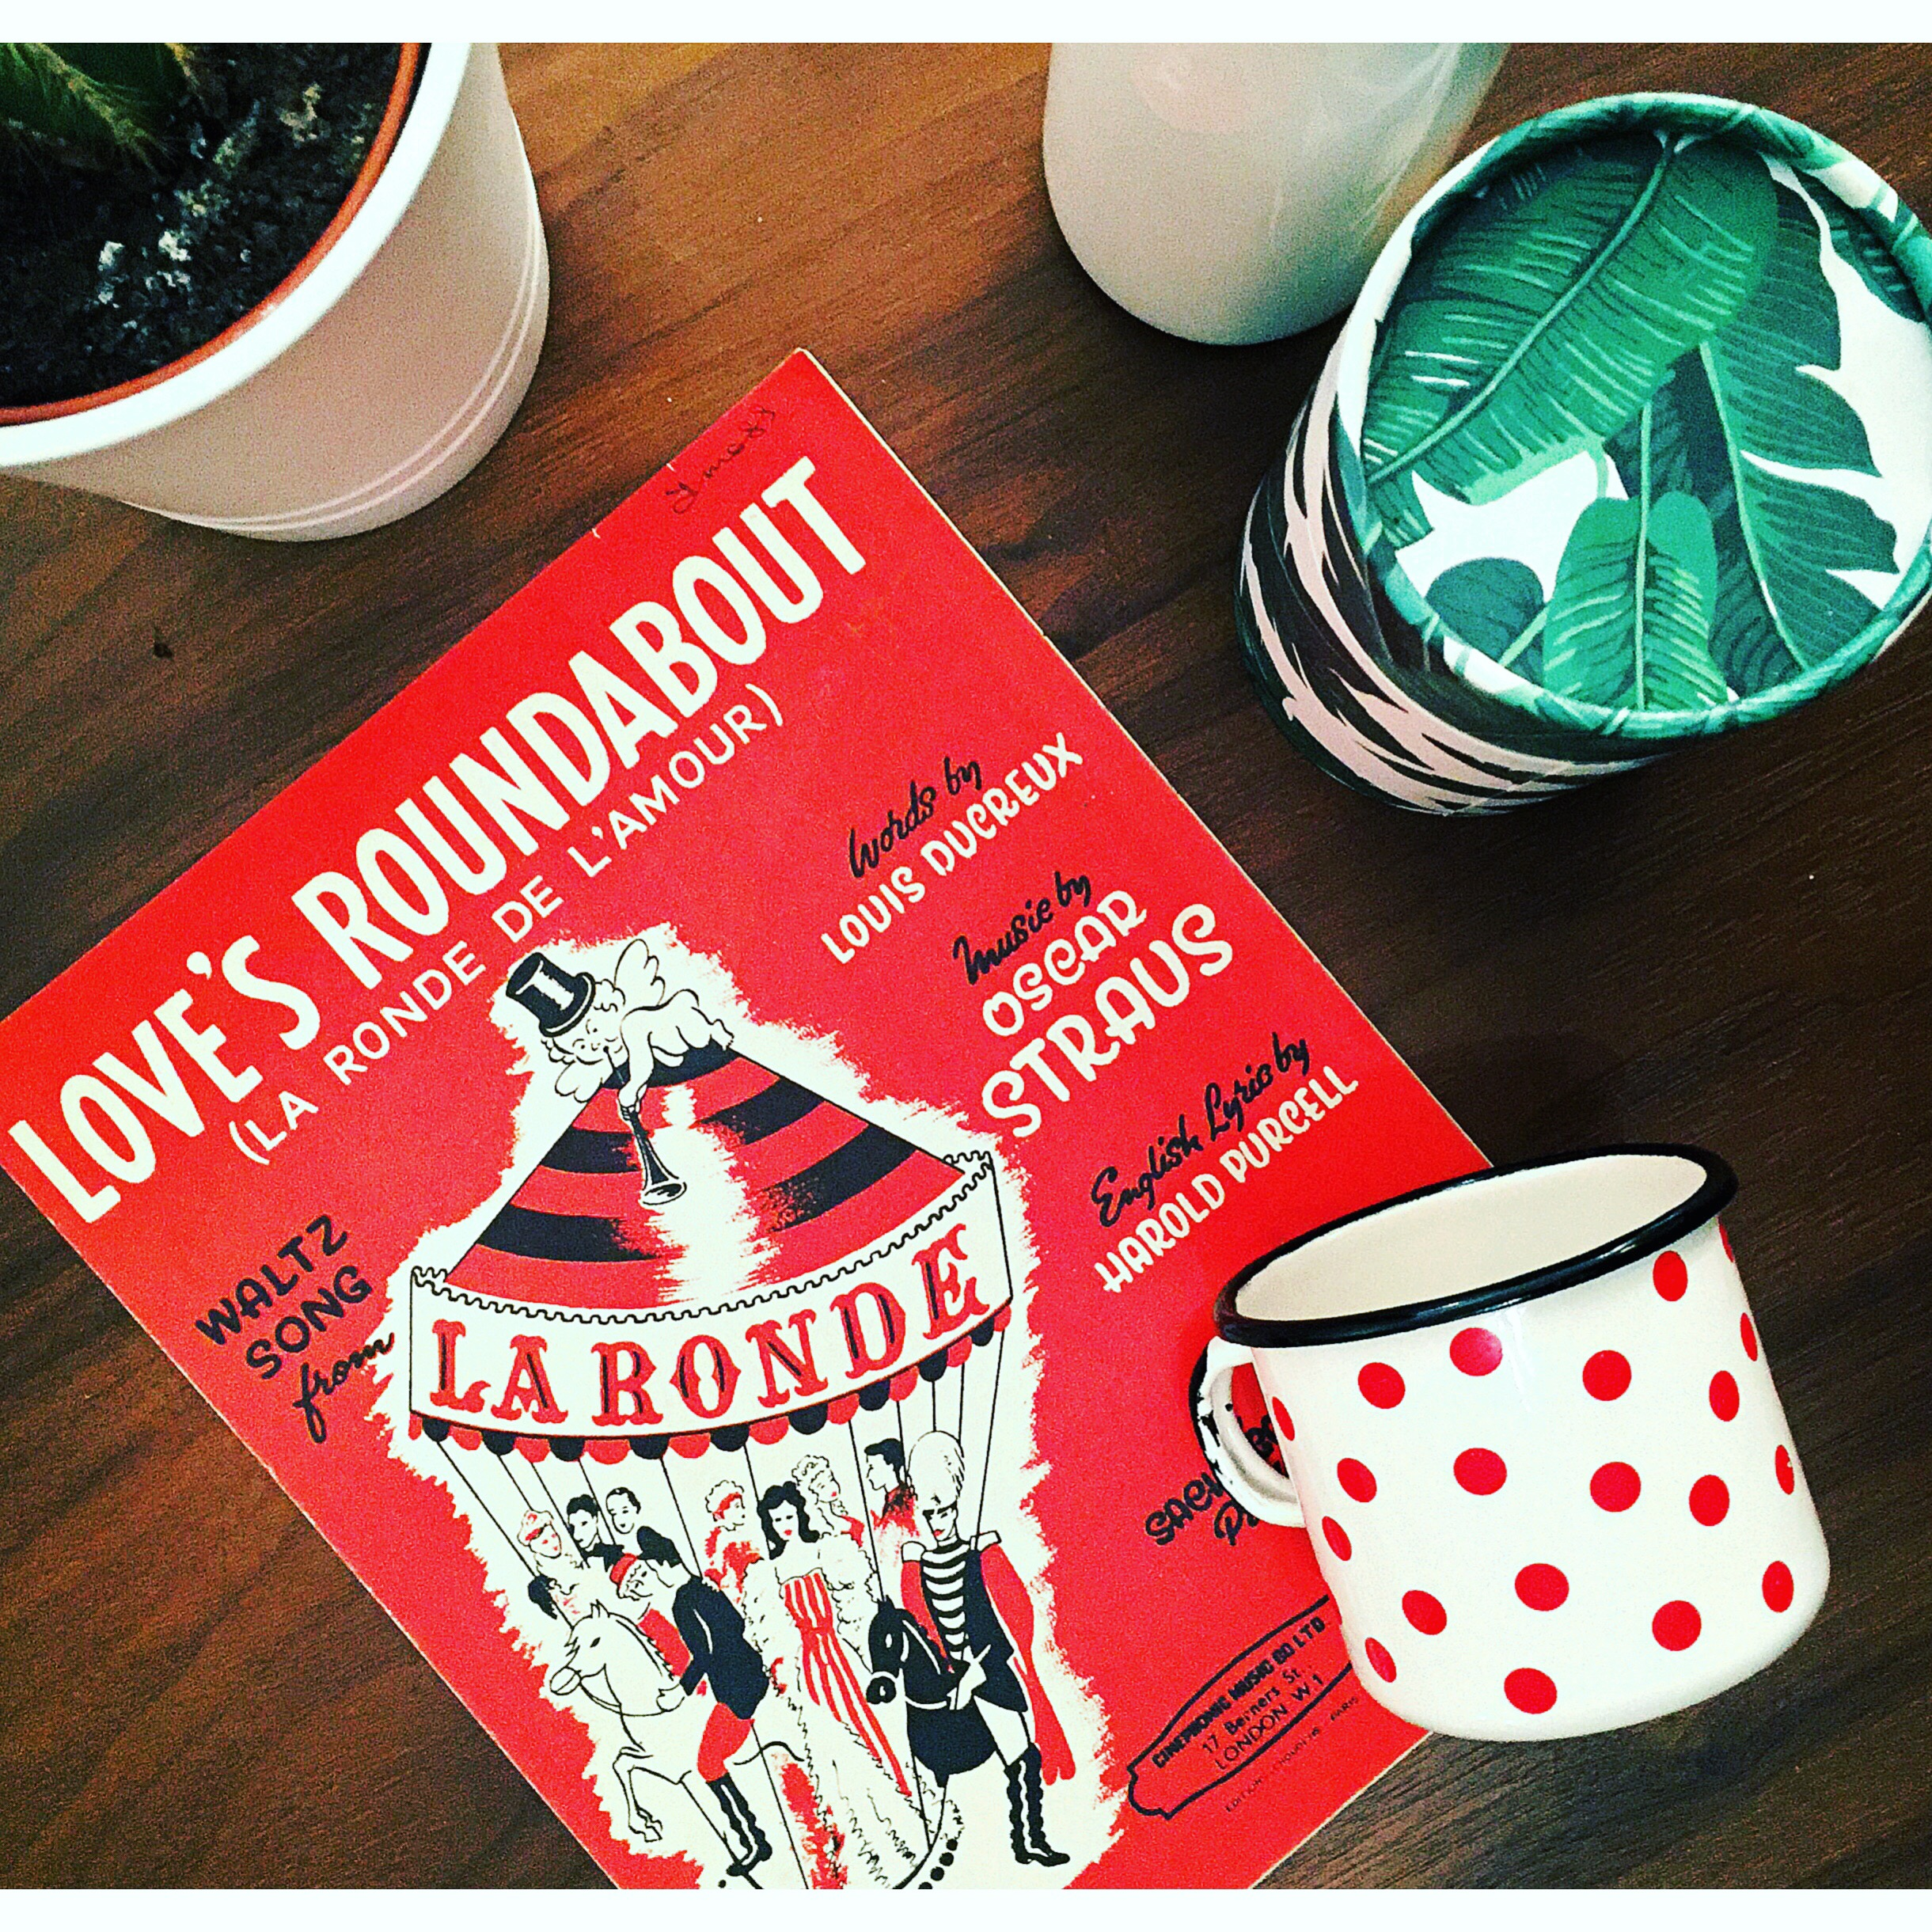 the-ink-closet-cheltenham-blog-antiques-vintage-polka-dot-mug.jpeg